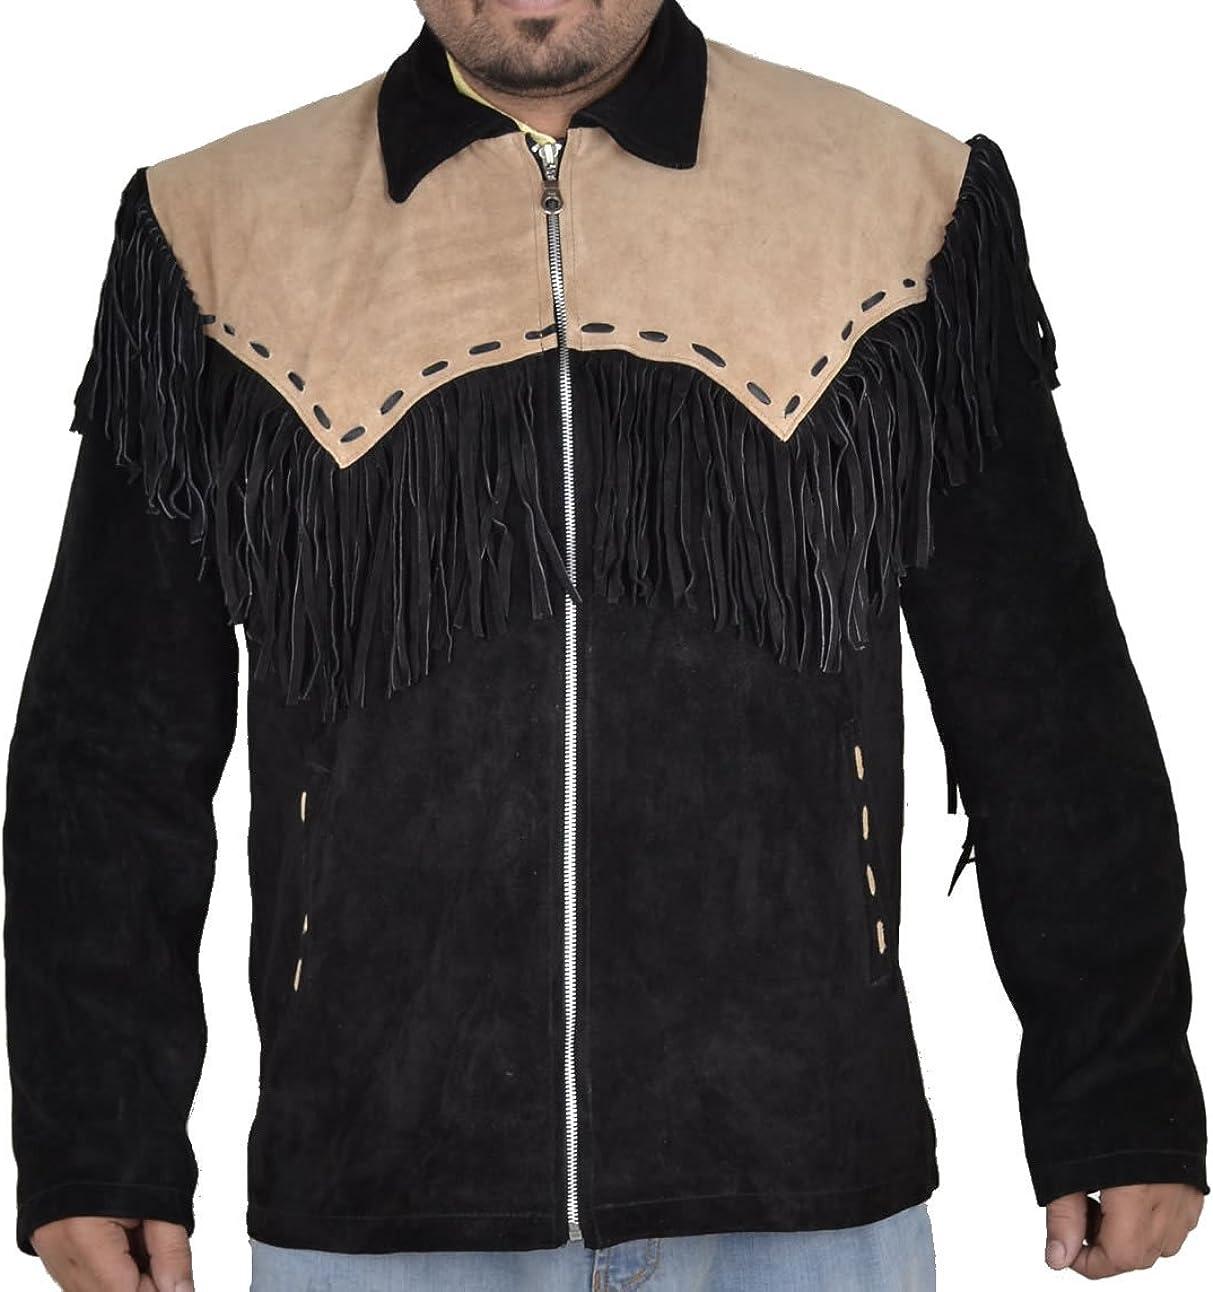 coolhides Men's Cowboy Suede Leather Jacket Black with Brown Patch